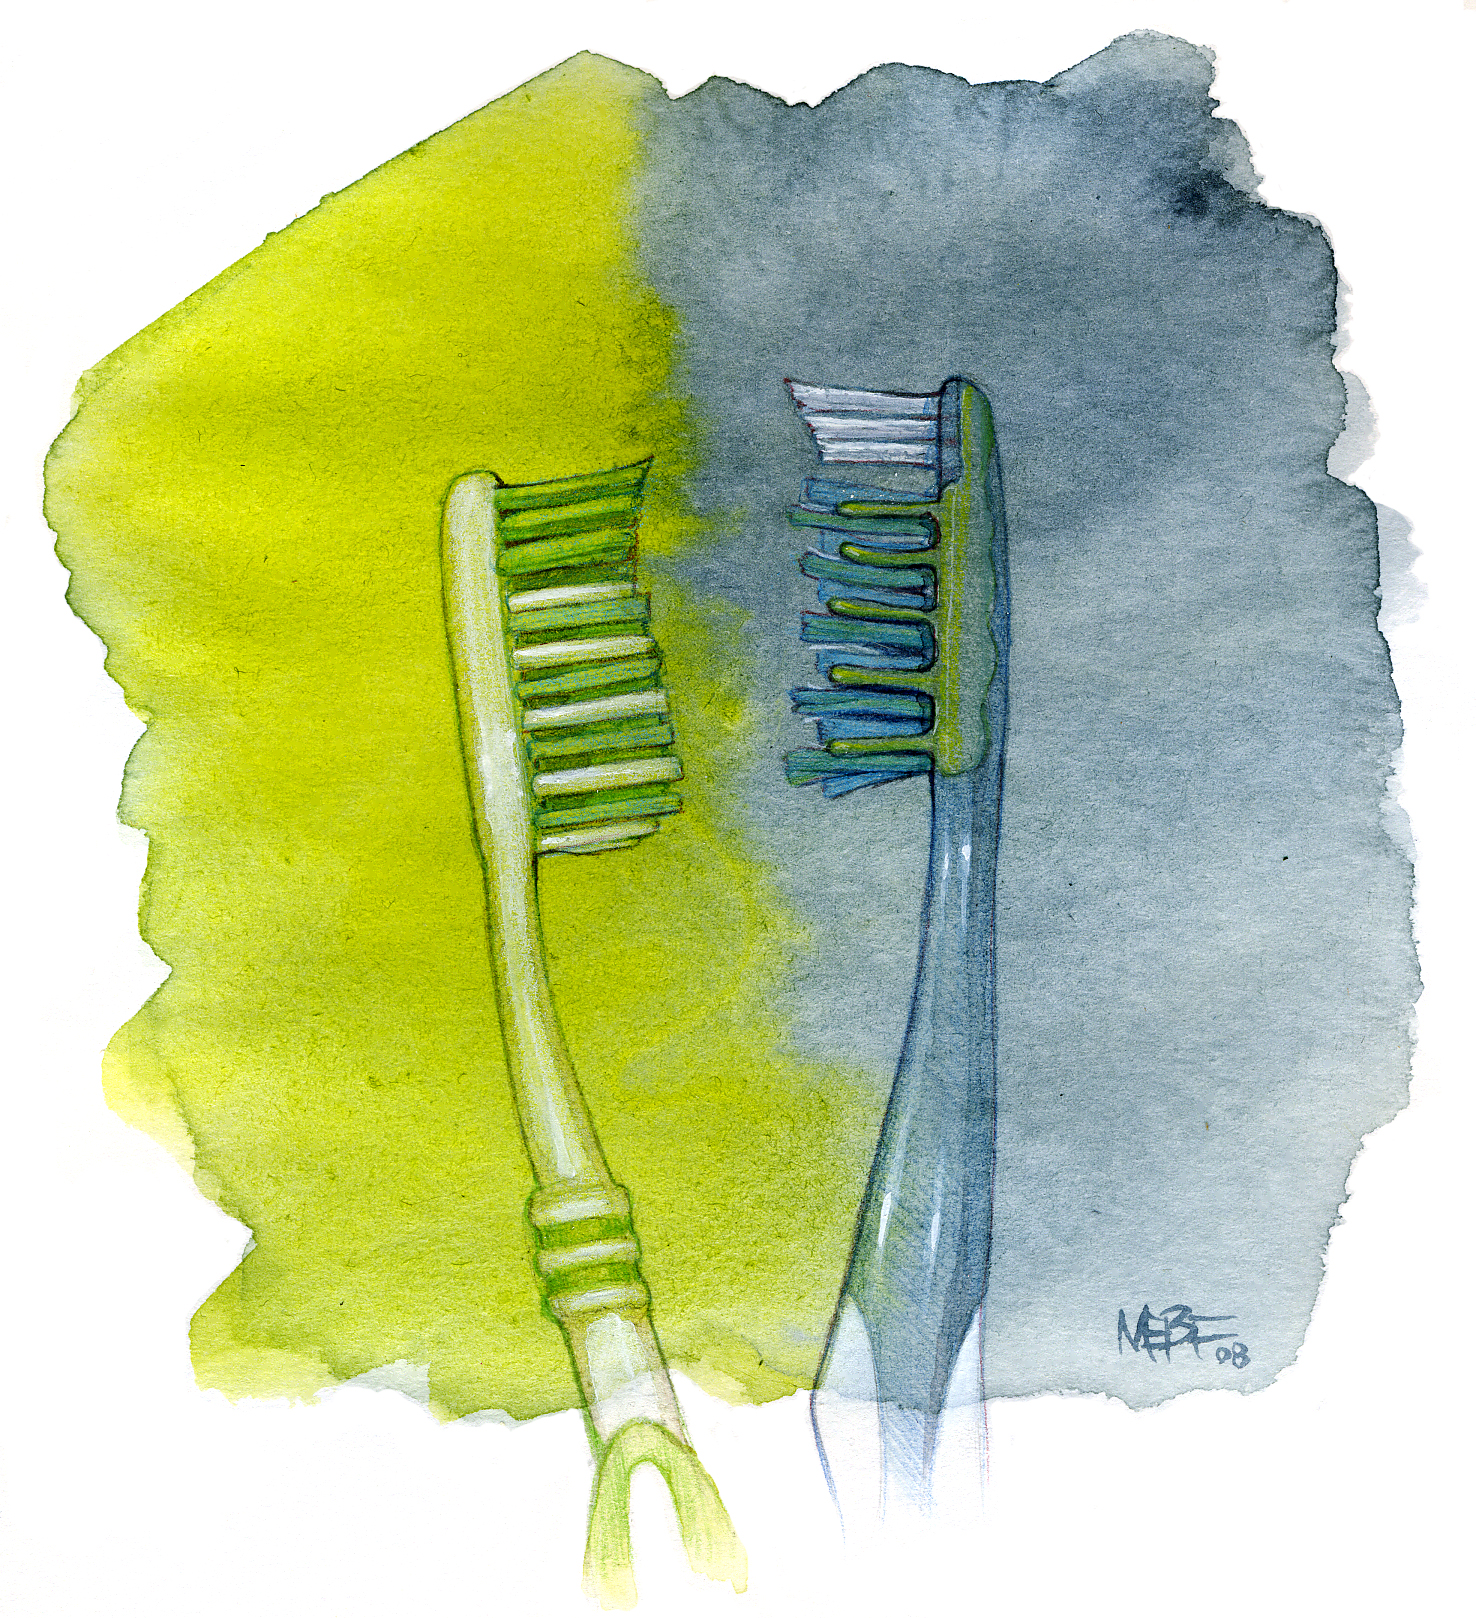 toothbrushes_of_love.jpg